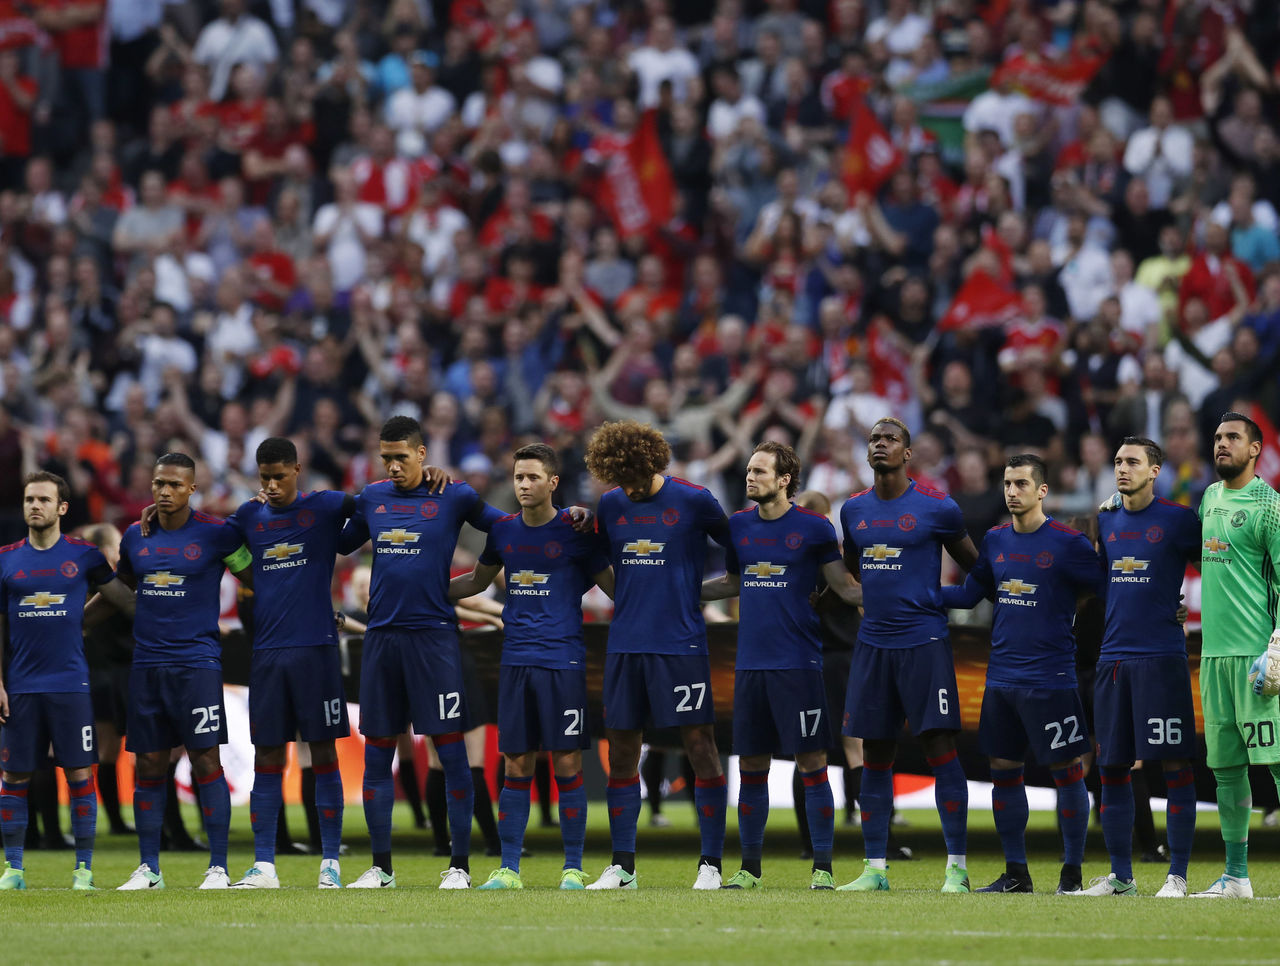 Cropped 2017 05 24t185206z 138653526 mt1aci14797577 rtrmadp 3 soccer europa final